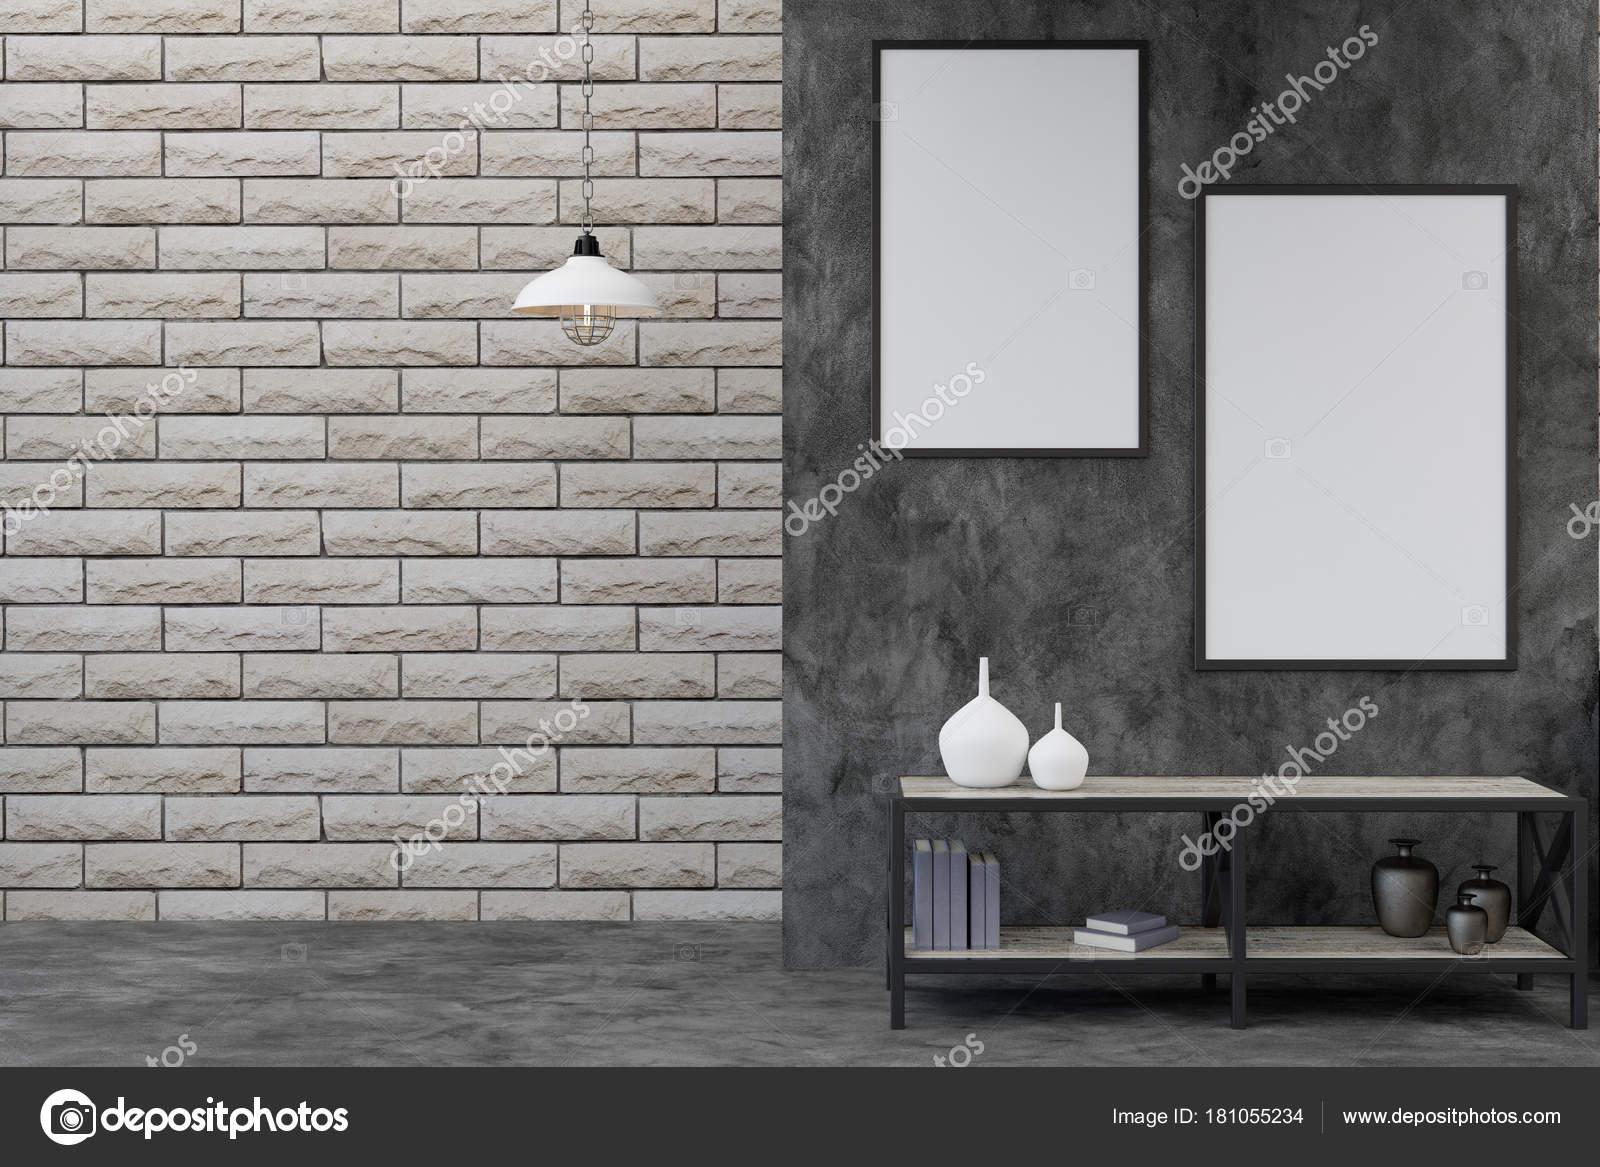 Modernes Zimmer mit leeren Plakatwände — Stockfoto © peshkova #181055234